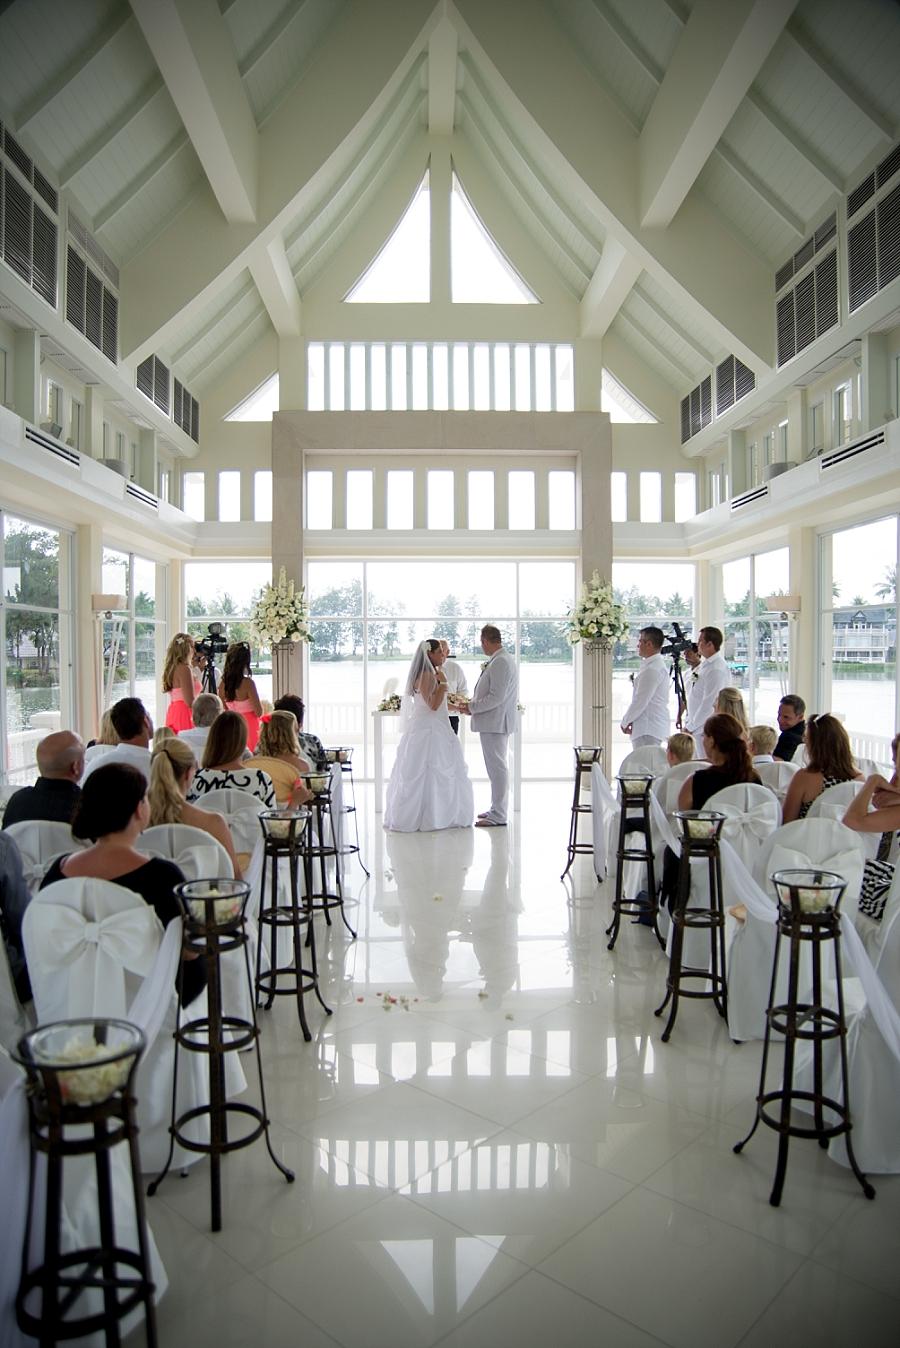 Darren Bester Photography - Cape Town Wedding Photographer - Destination Wedding - Thailand - Stacy and Shaun_0039.jpg